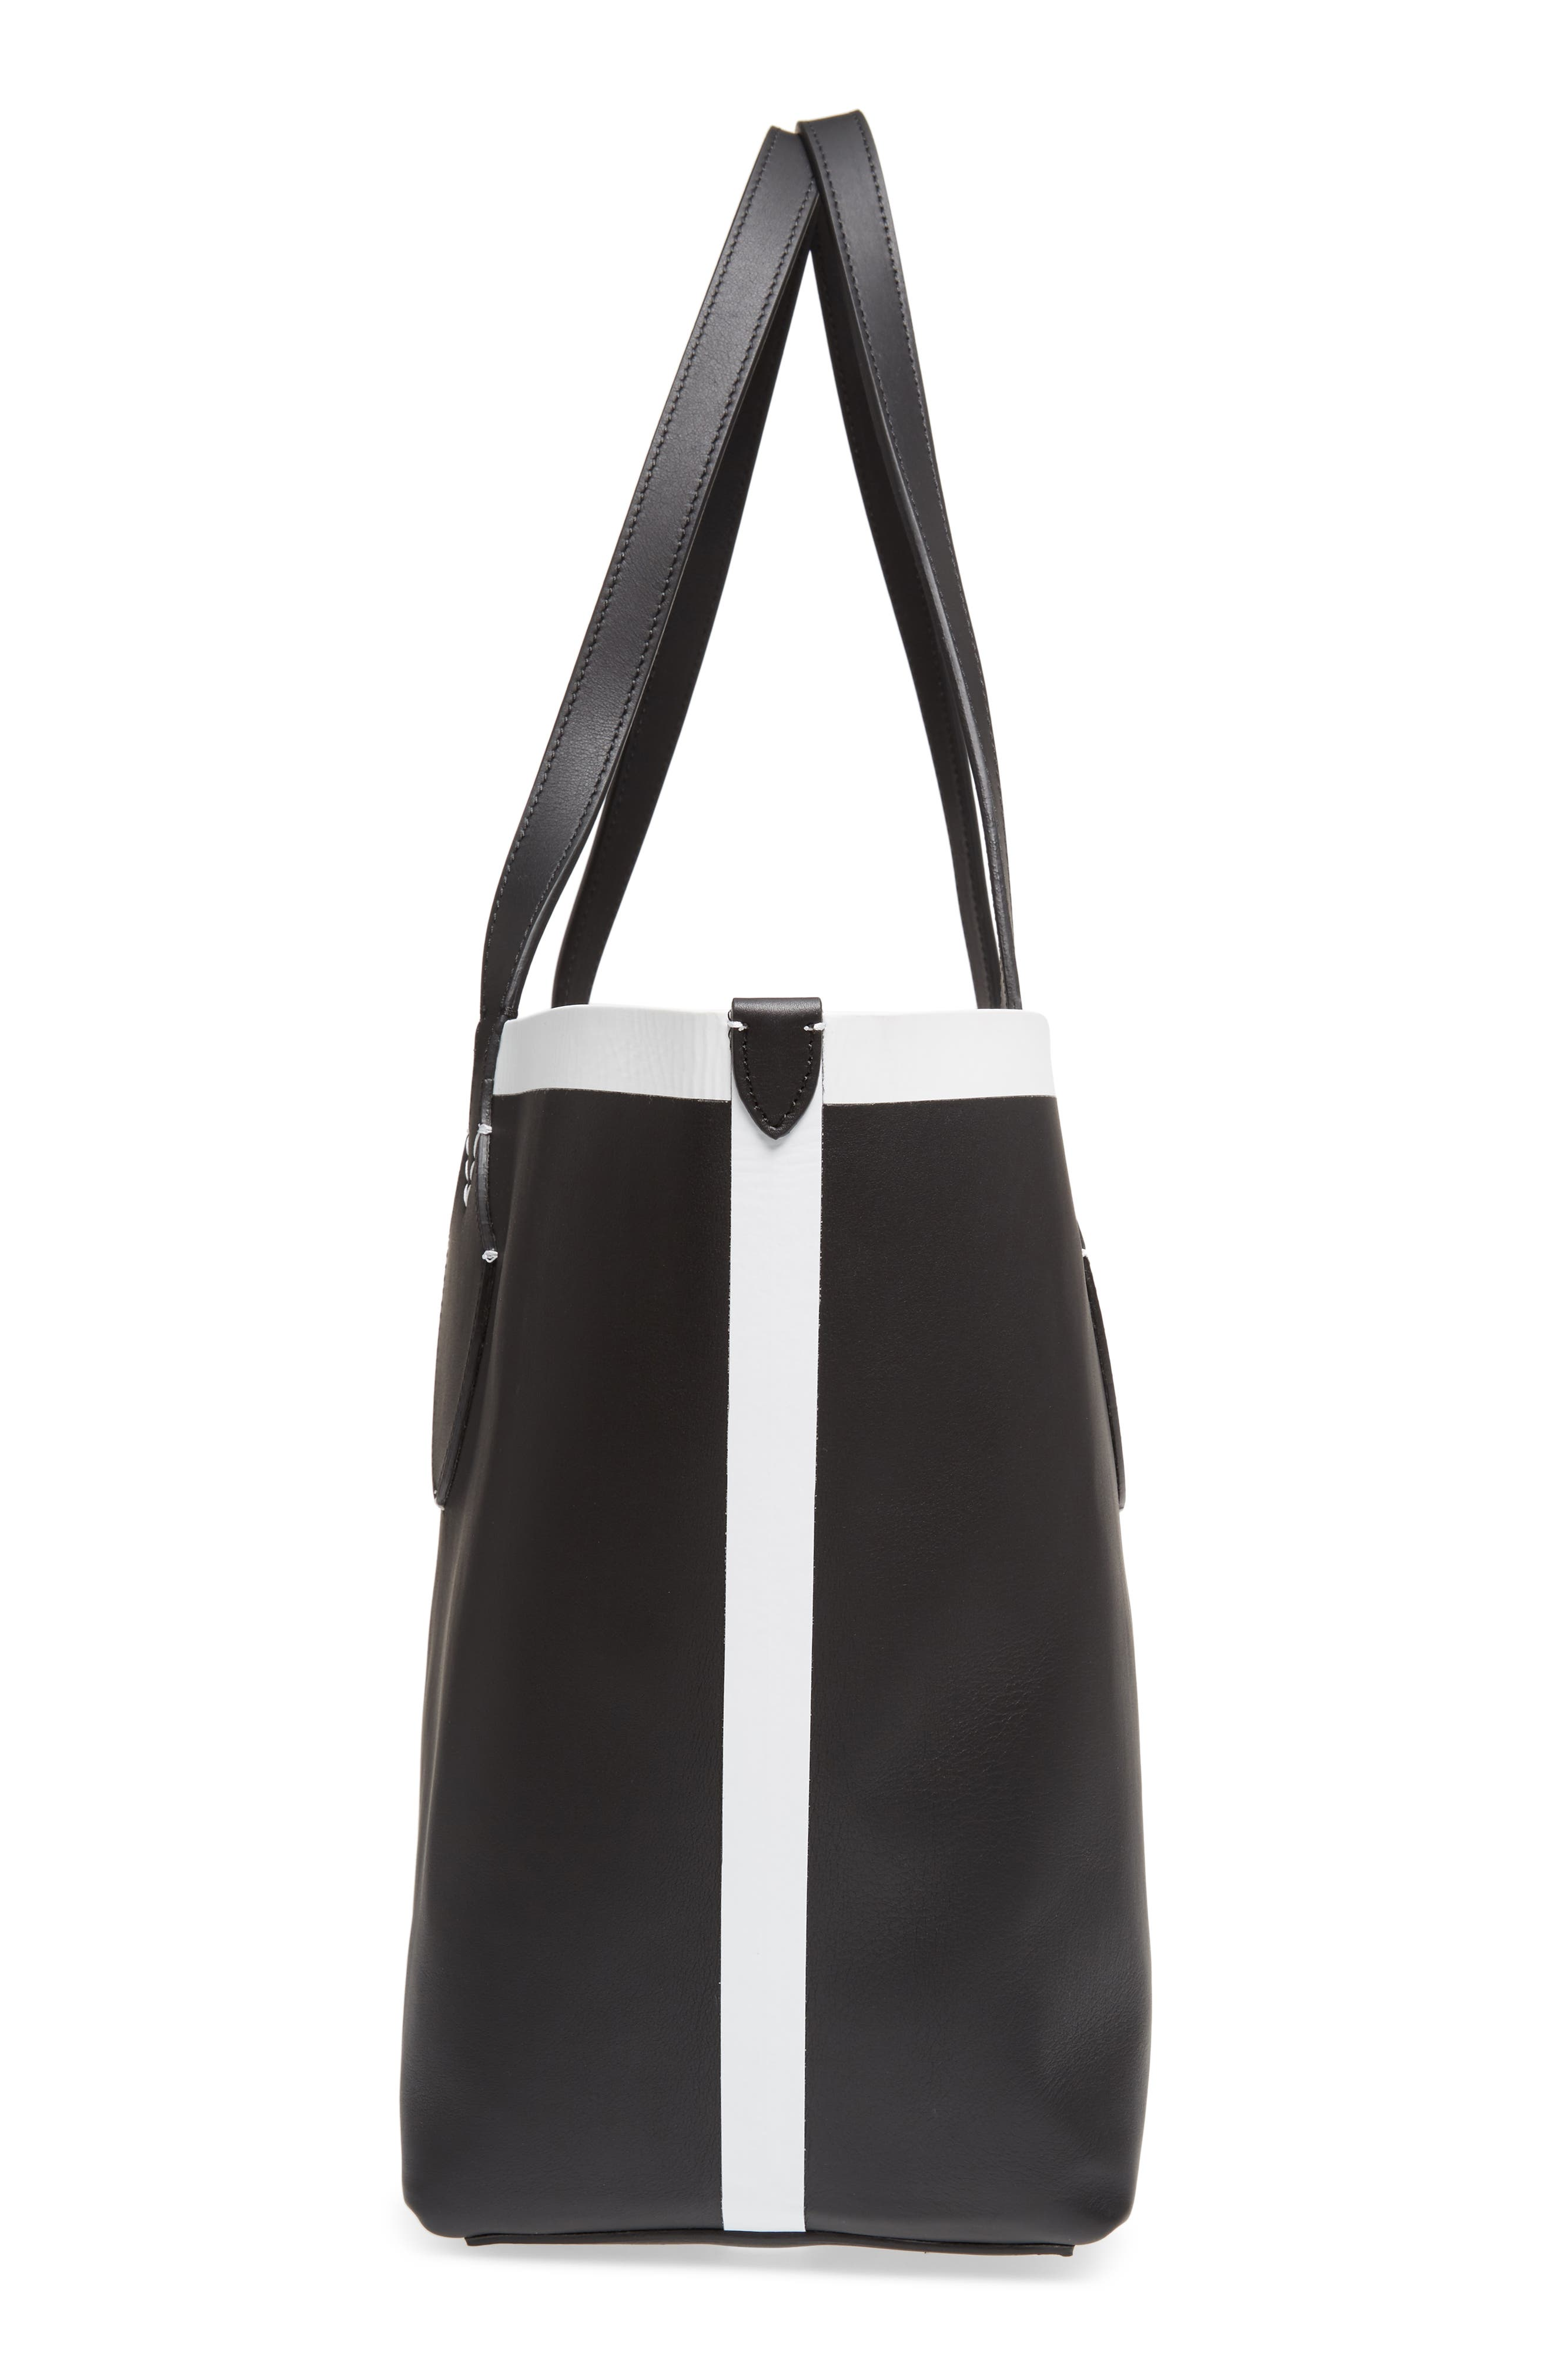 Medium Reversible Leather & Check Canvas Tote,                             Alternate thumbnail 6, color,                             BLACK/ WHITE